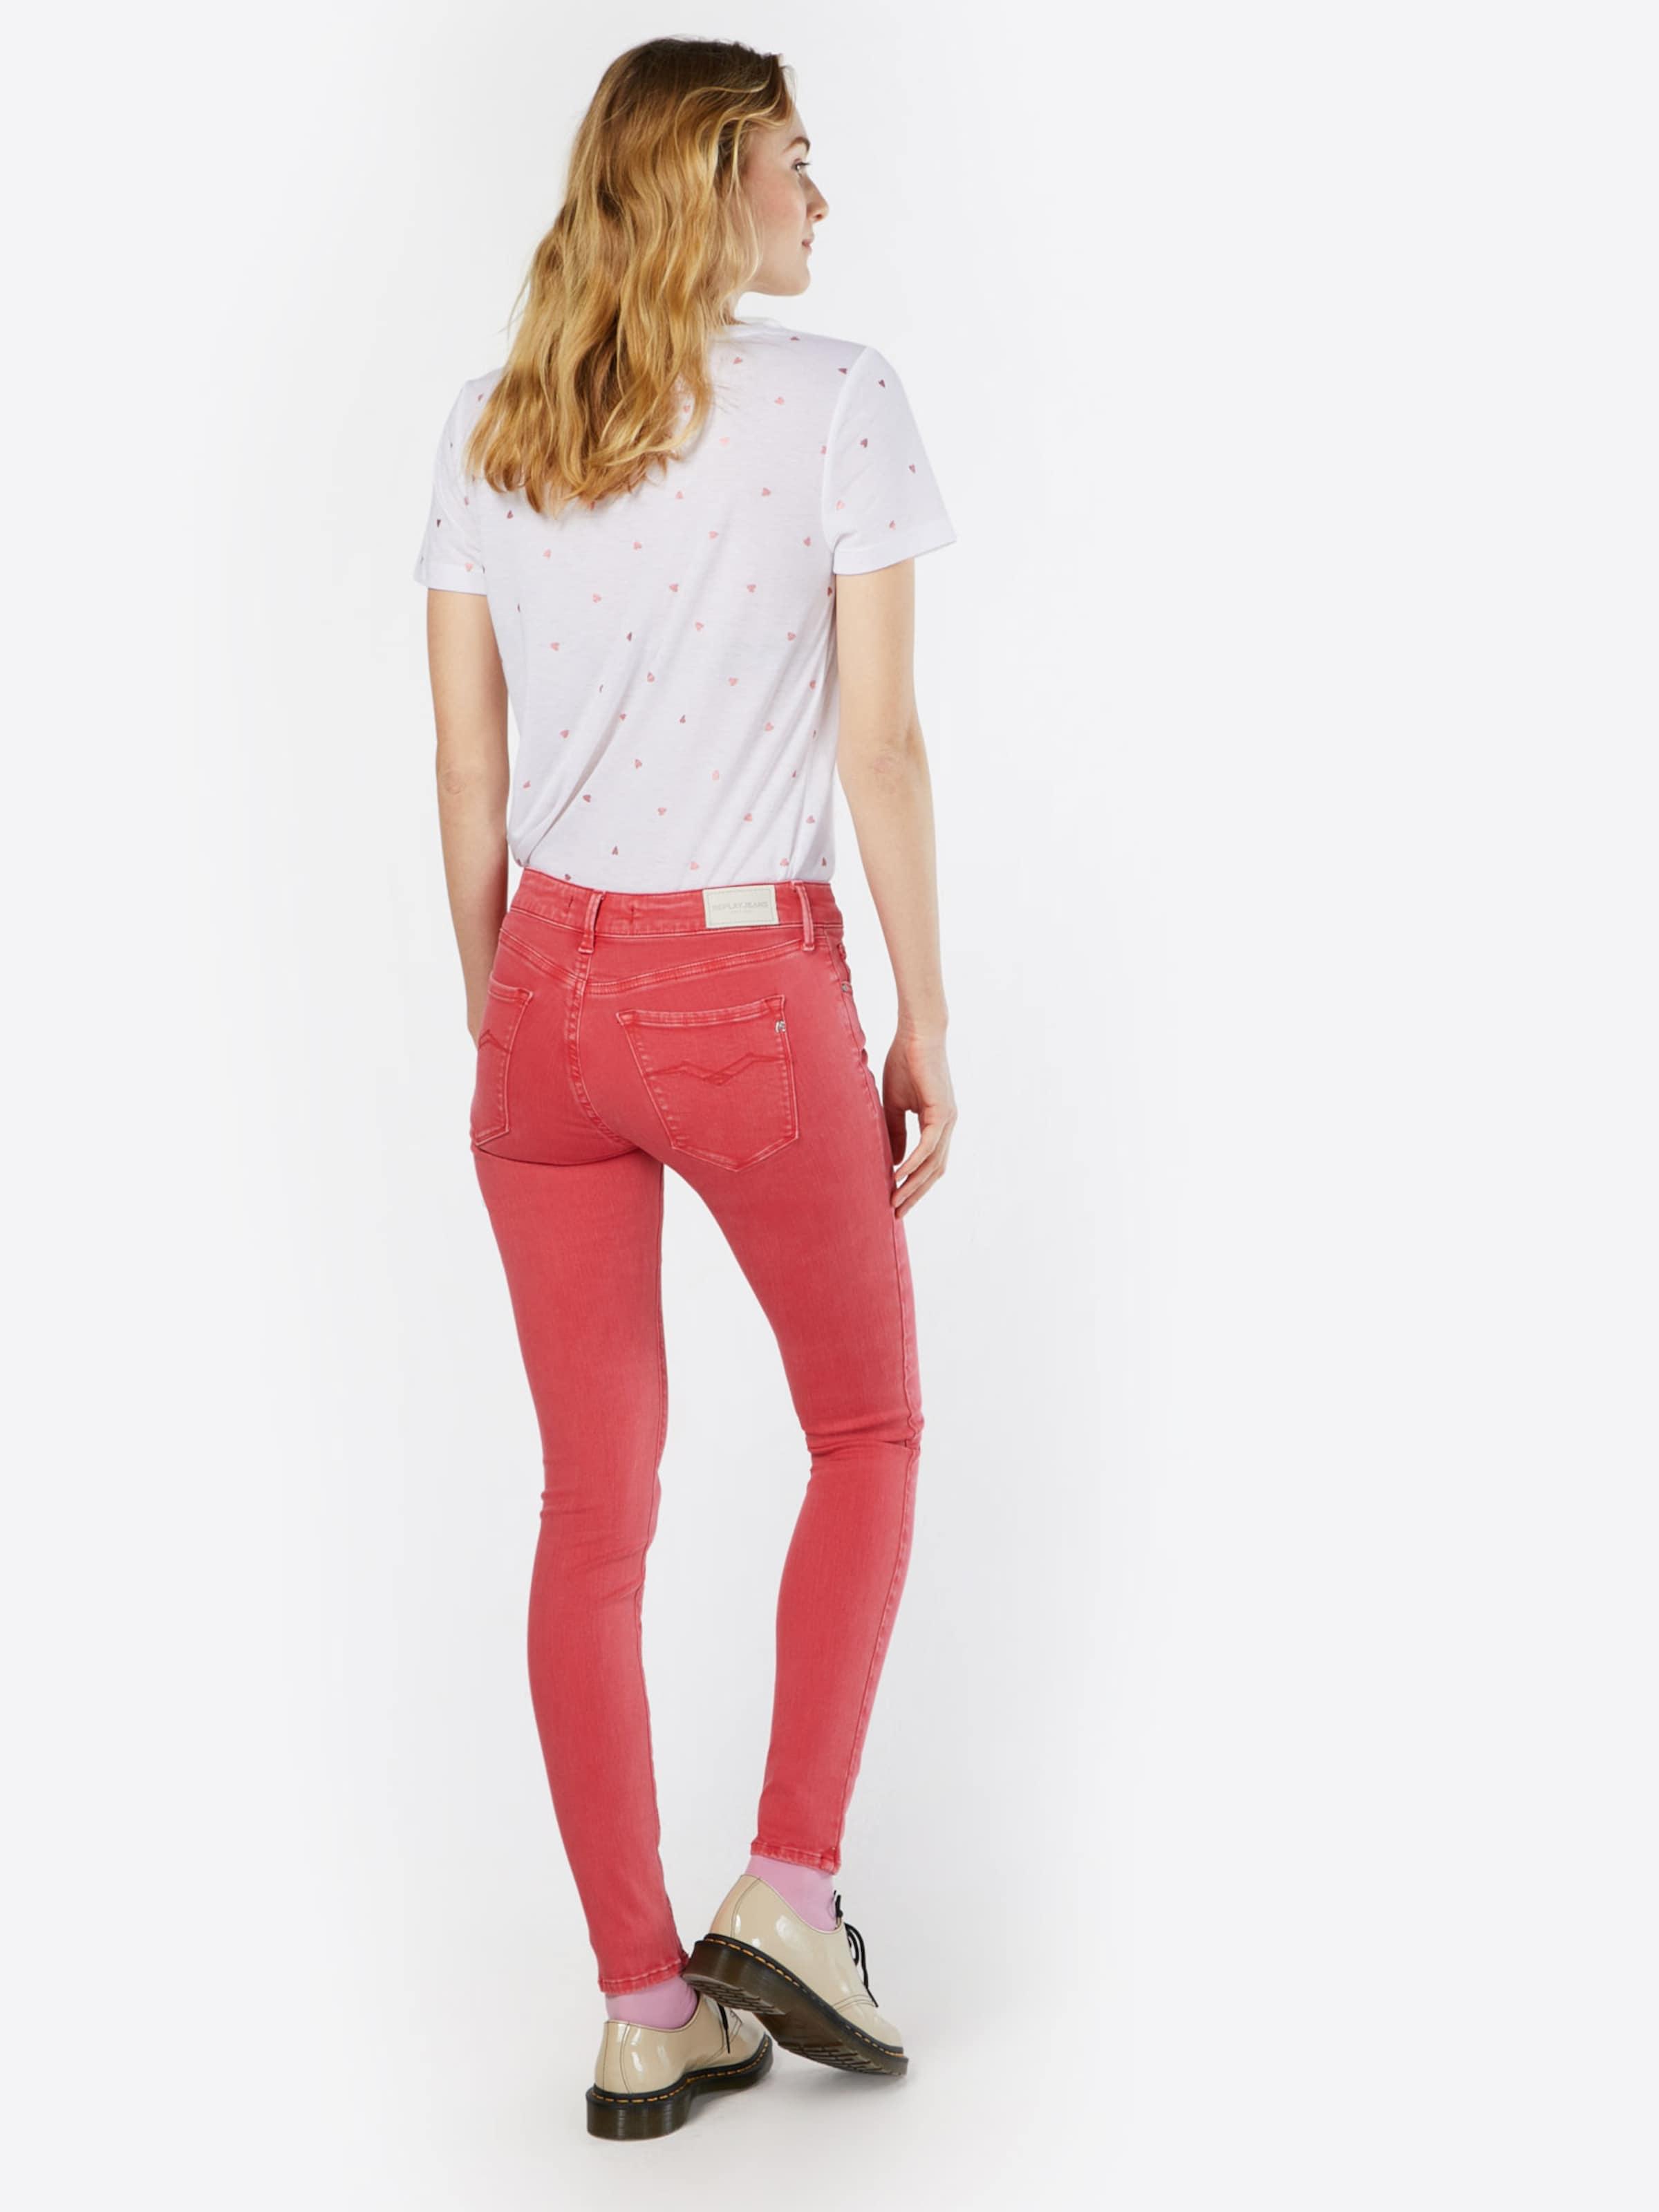 'luz' In Replay In Replay 'luz' In Replay Jeans 'luz' Pastellrot Jeans Jeans Pastellrot 15uFJK3Tlc